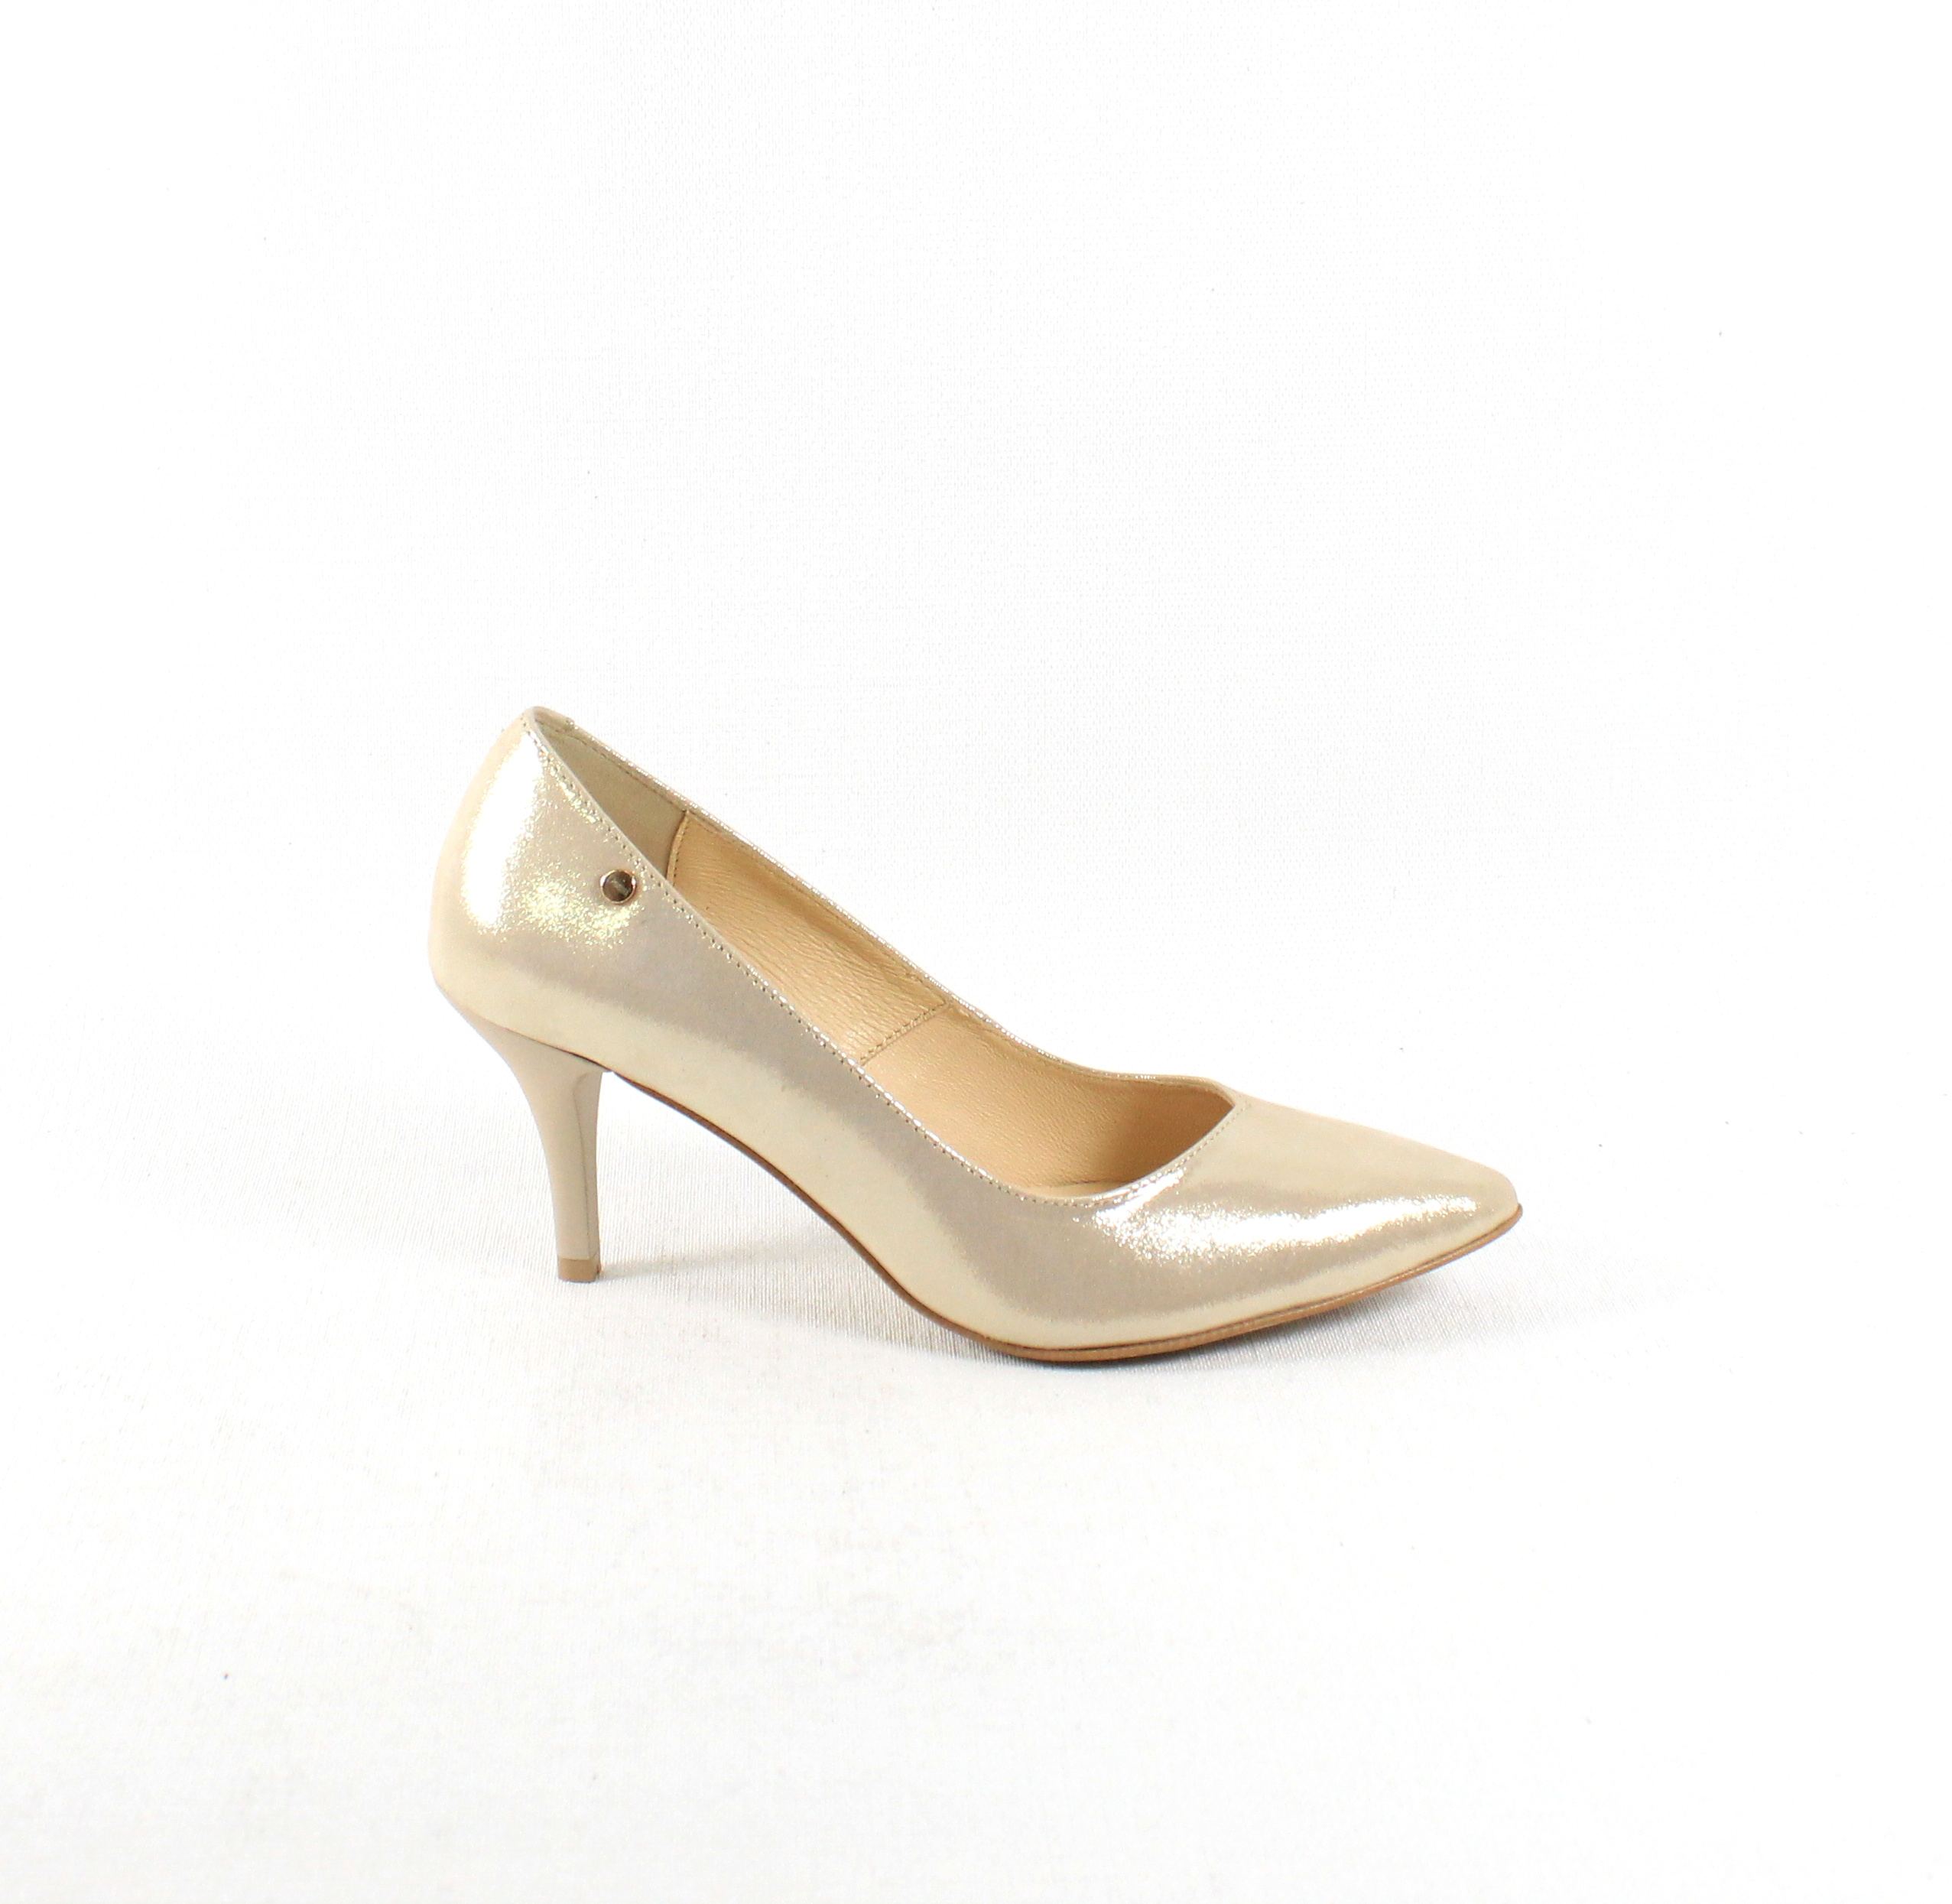 7d0622a937 Dámske lodičky CLAUDIO DESSI 5483 ZLATE – Topánky Olympia shoes